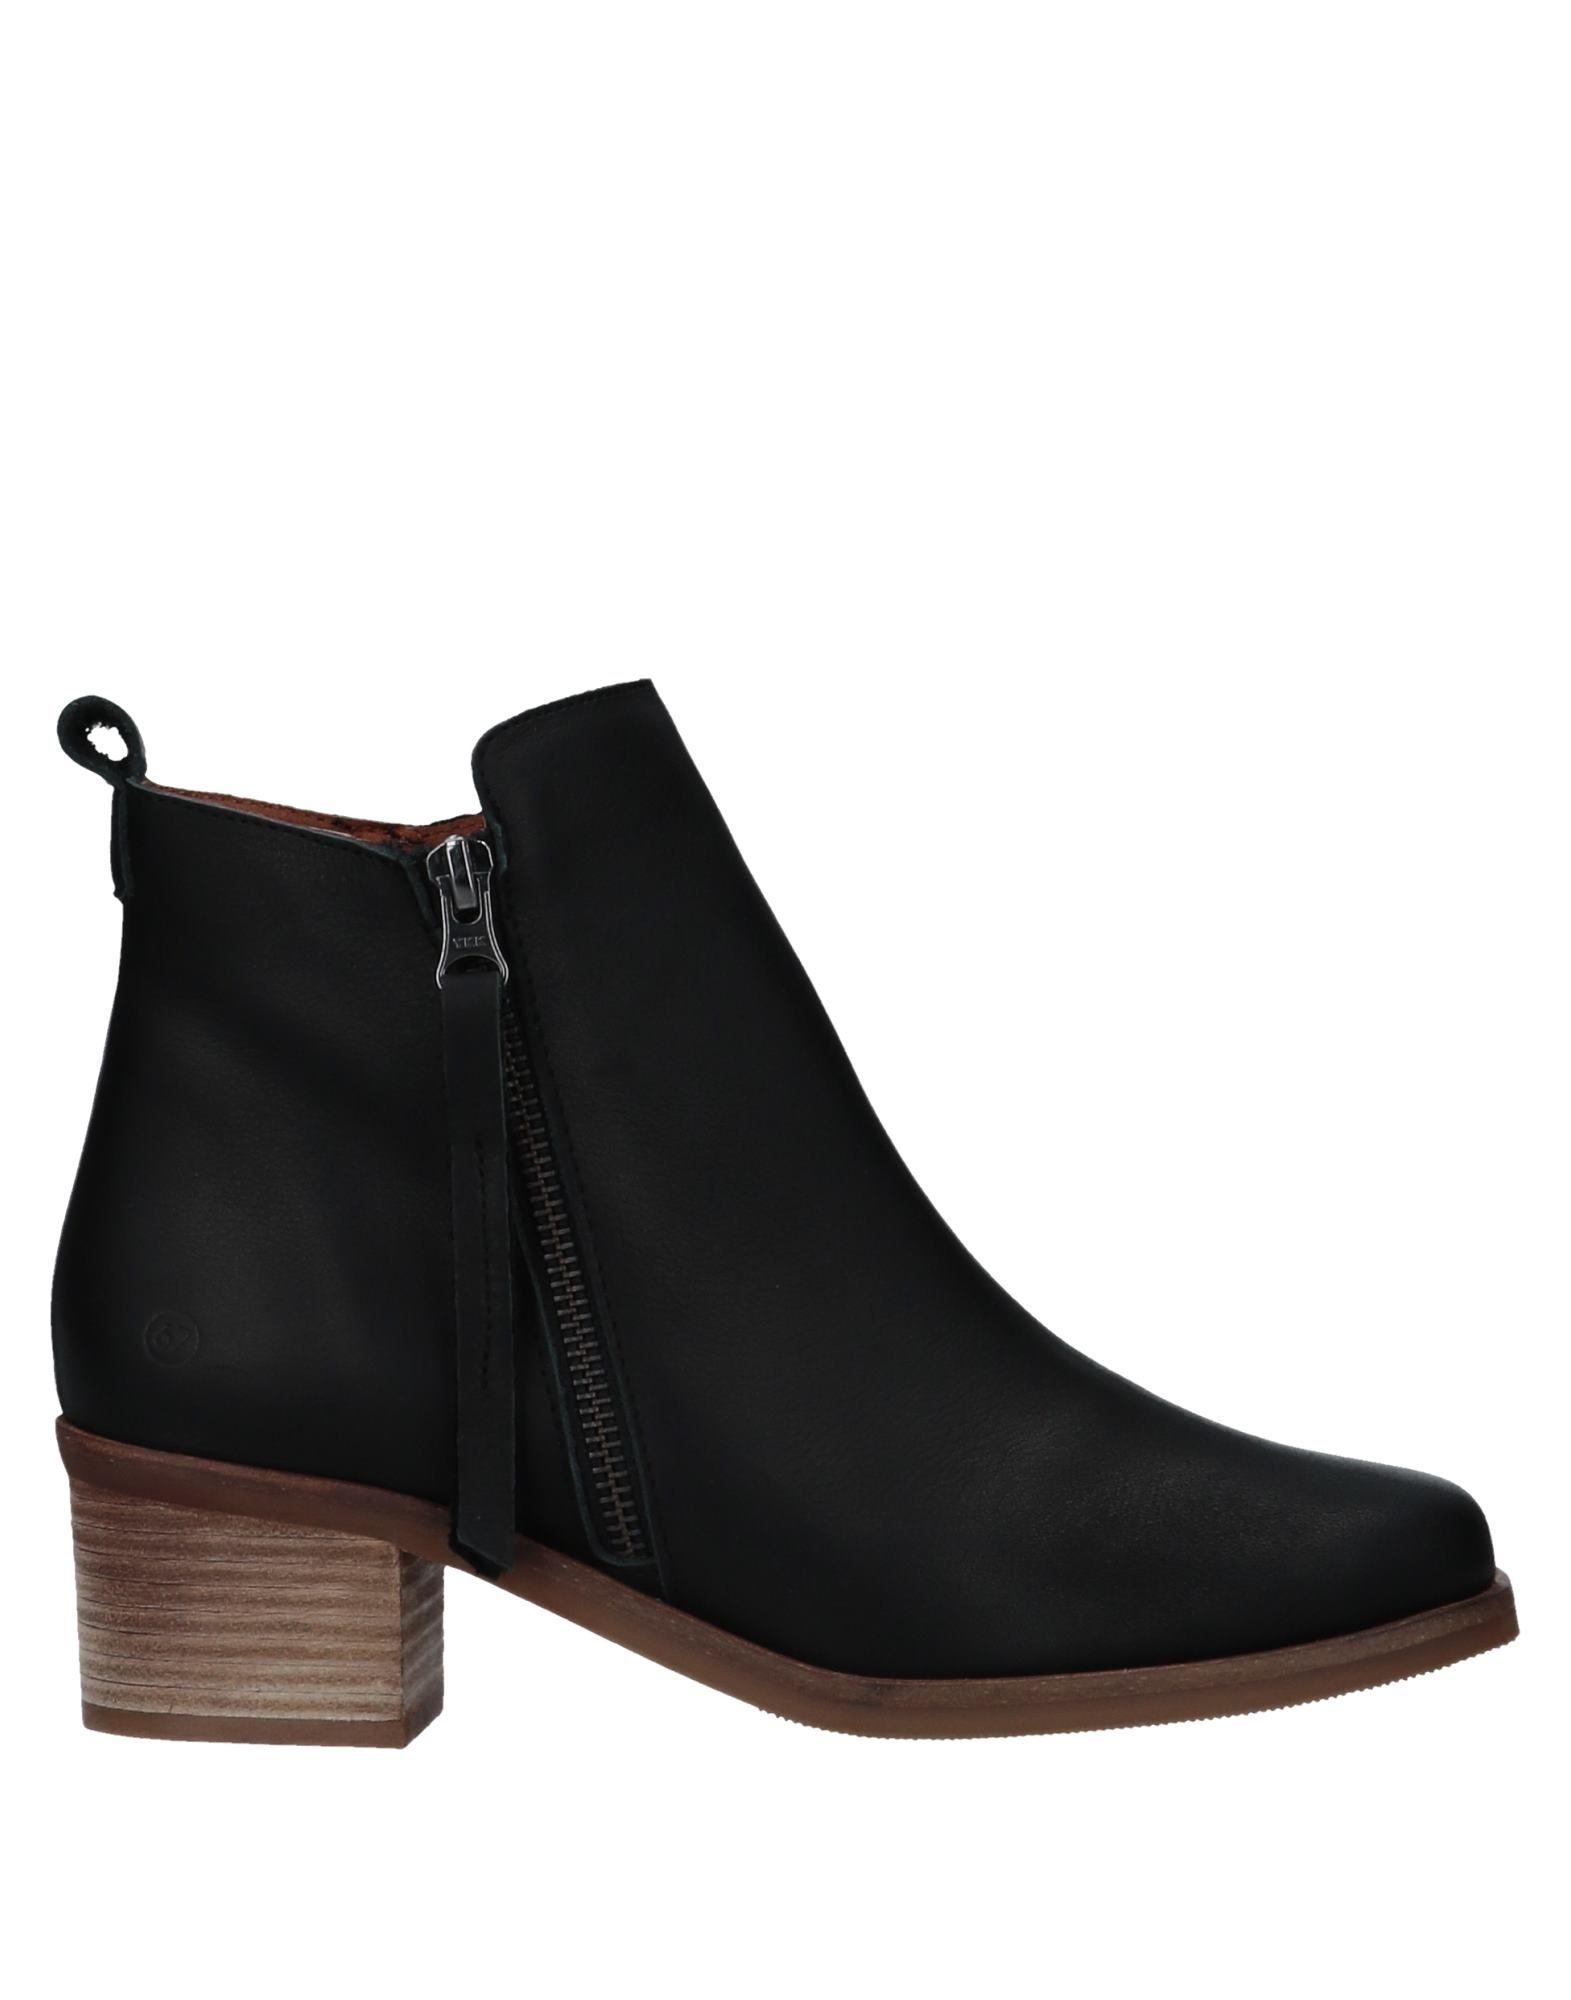 67 Sixtyseven Stiefelette Damen 11541470VU Gute Qualität beliebte Schuhe